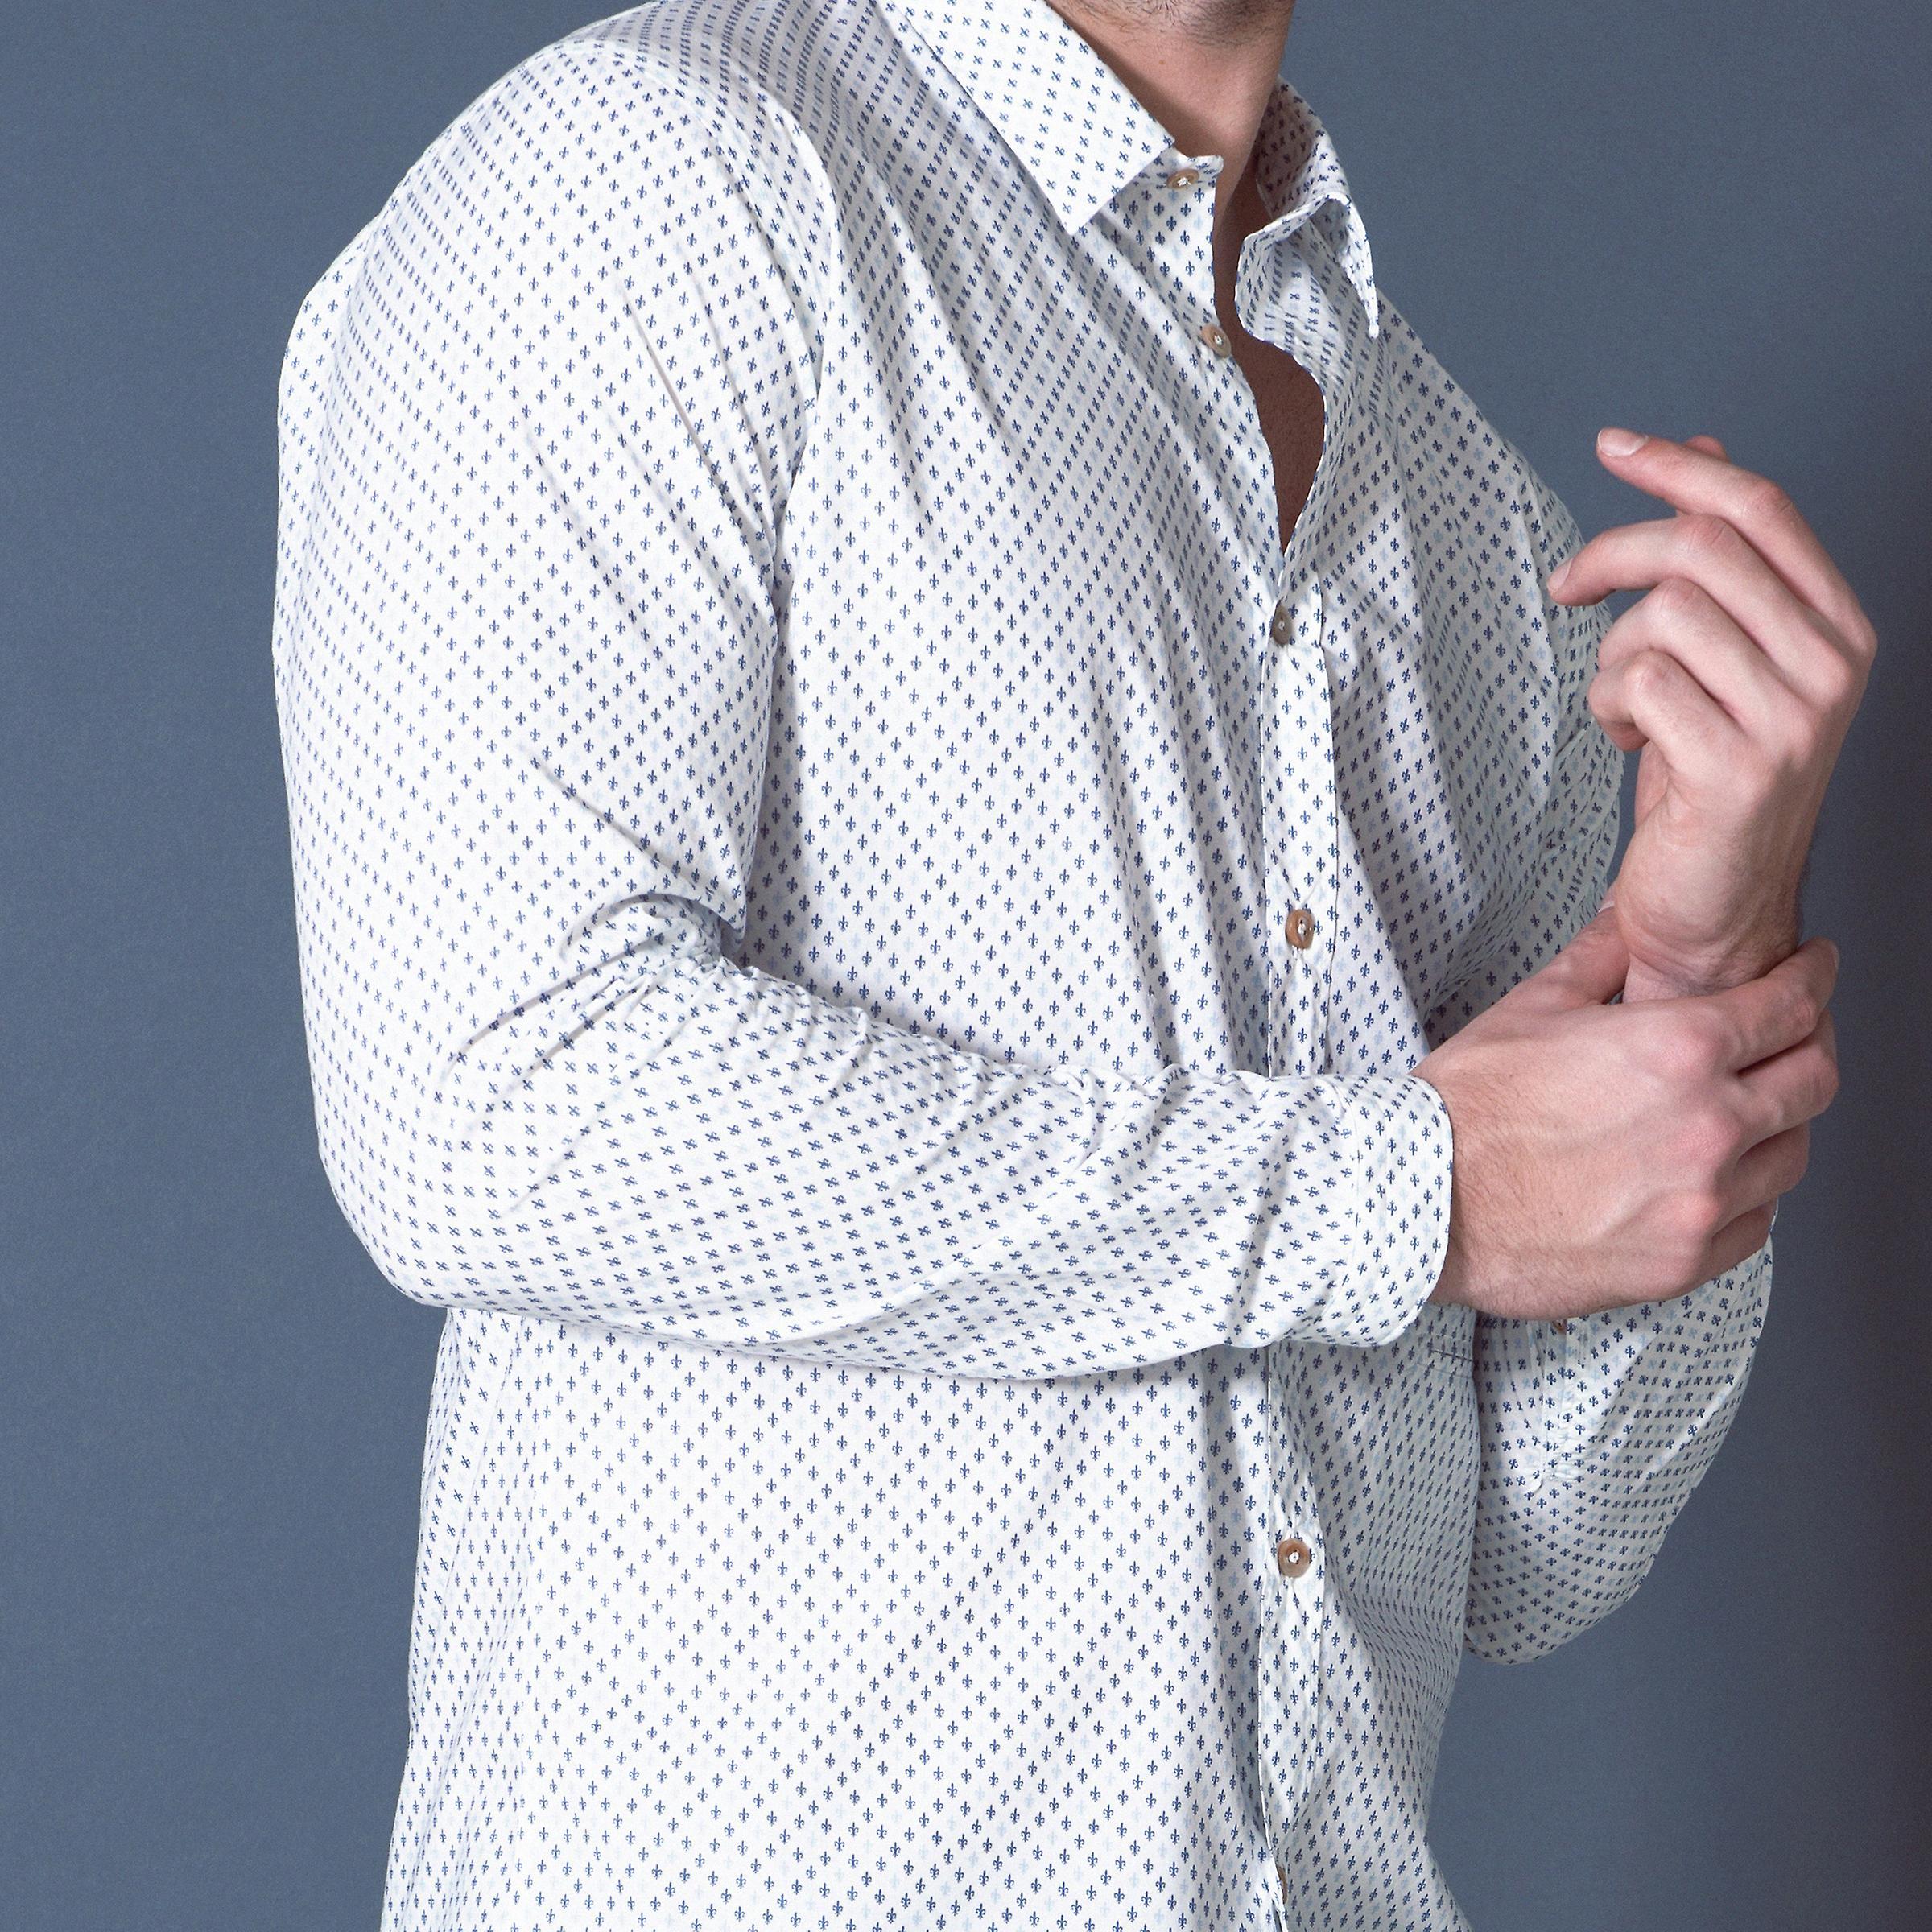 Fabio Giovanni Potenza Shirt - Lightweight Poplin Cotton Italian Casual Shirt